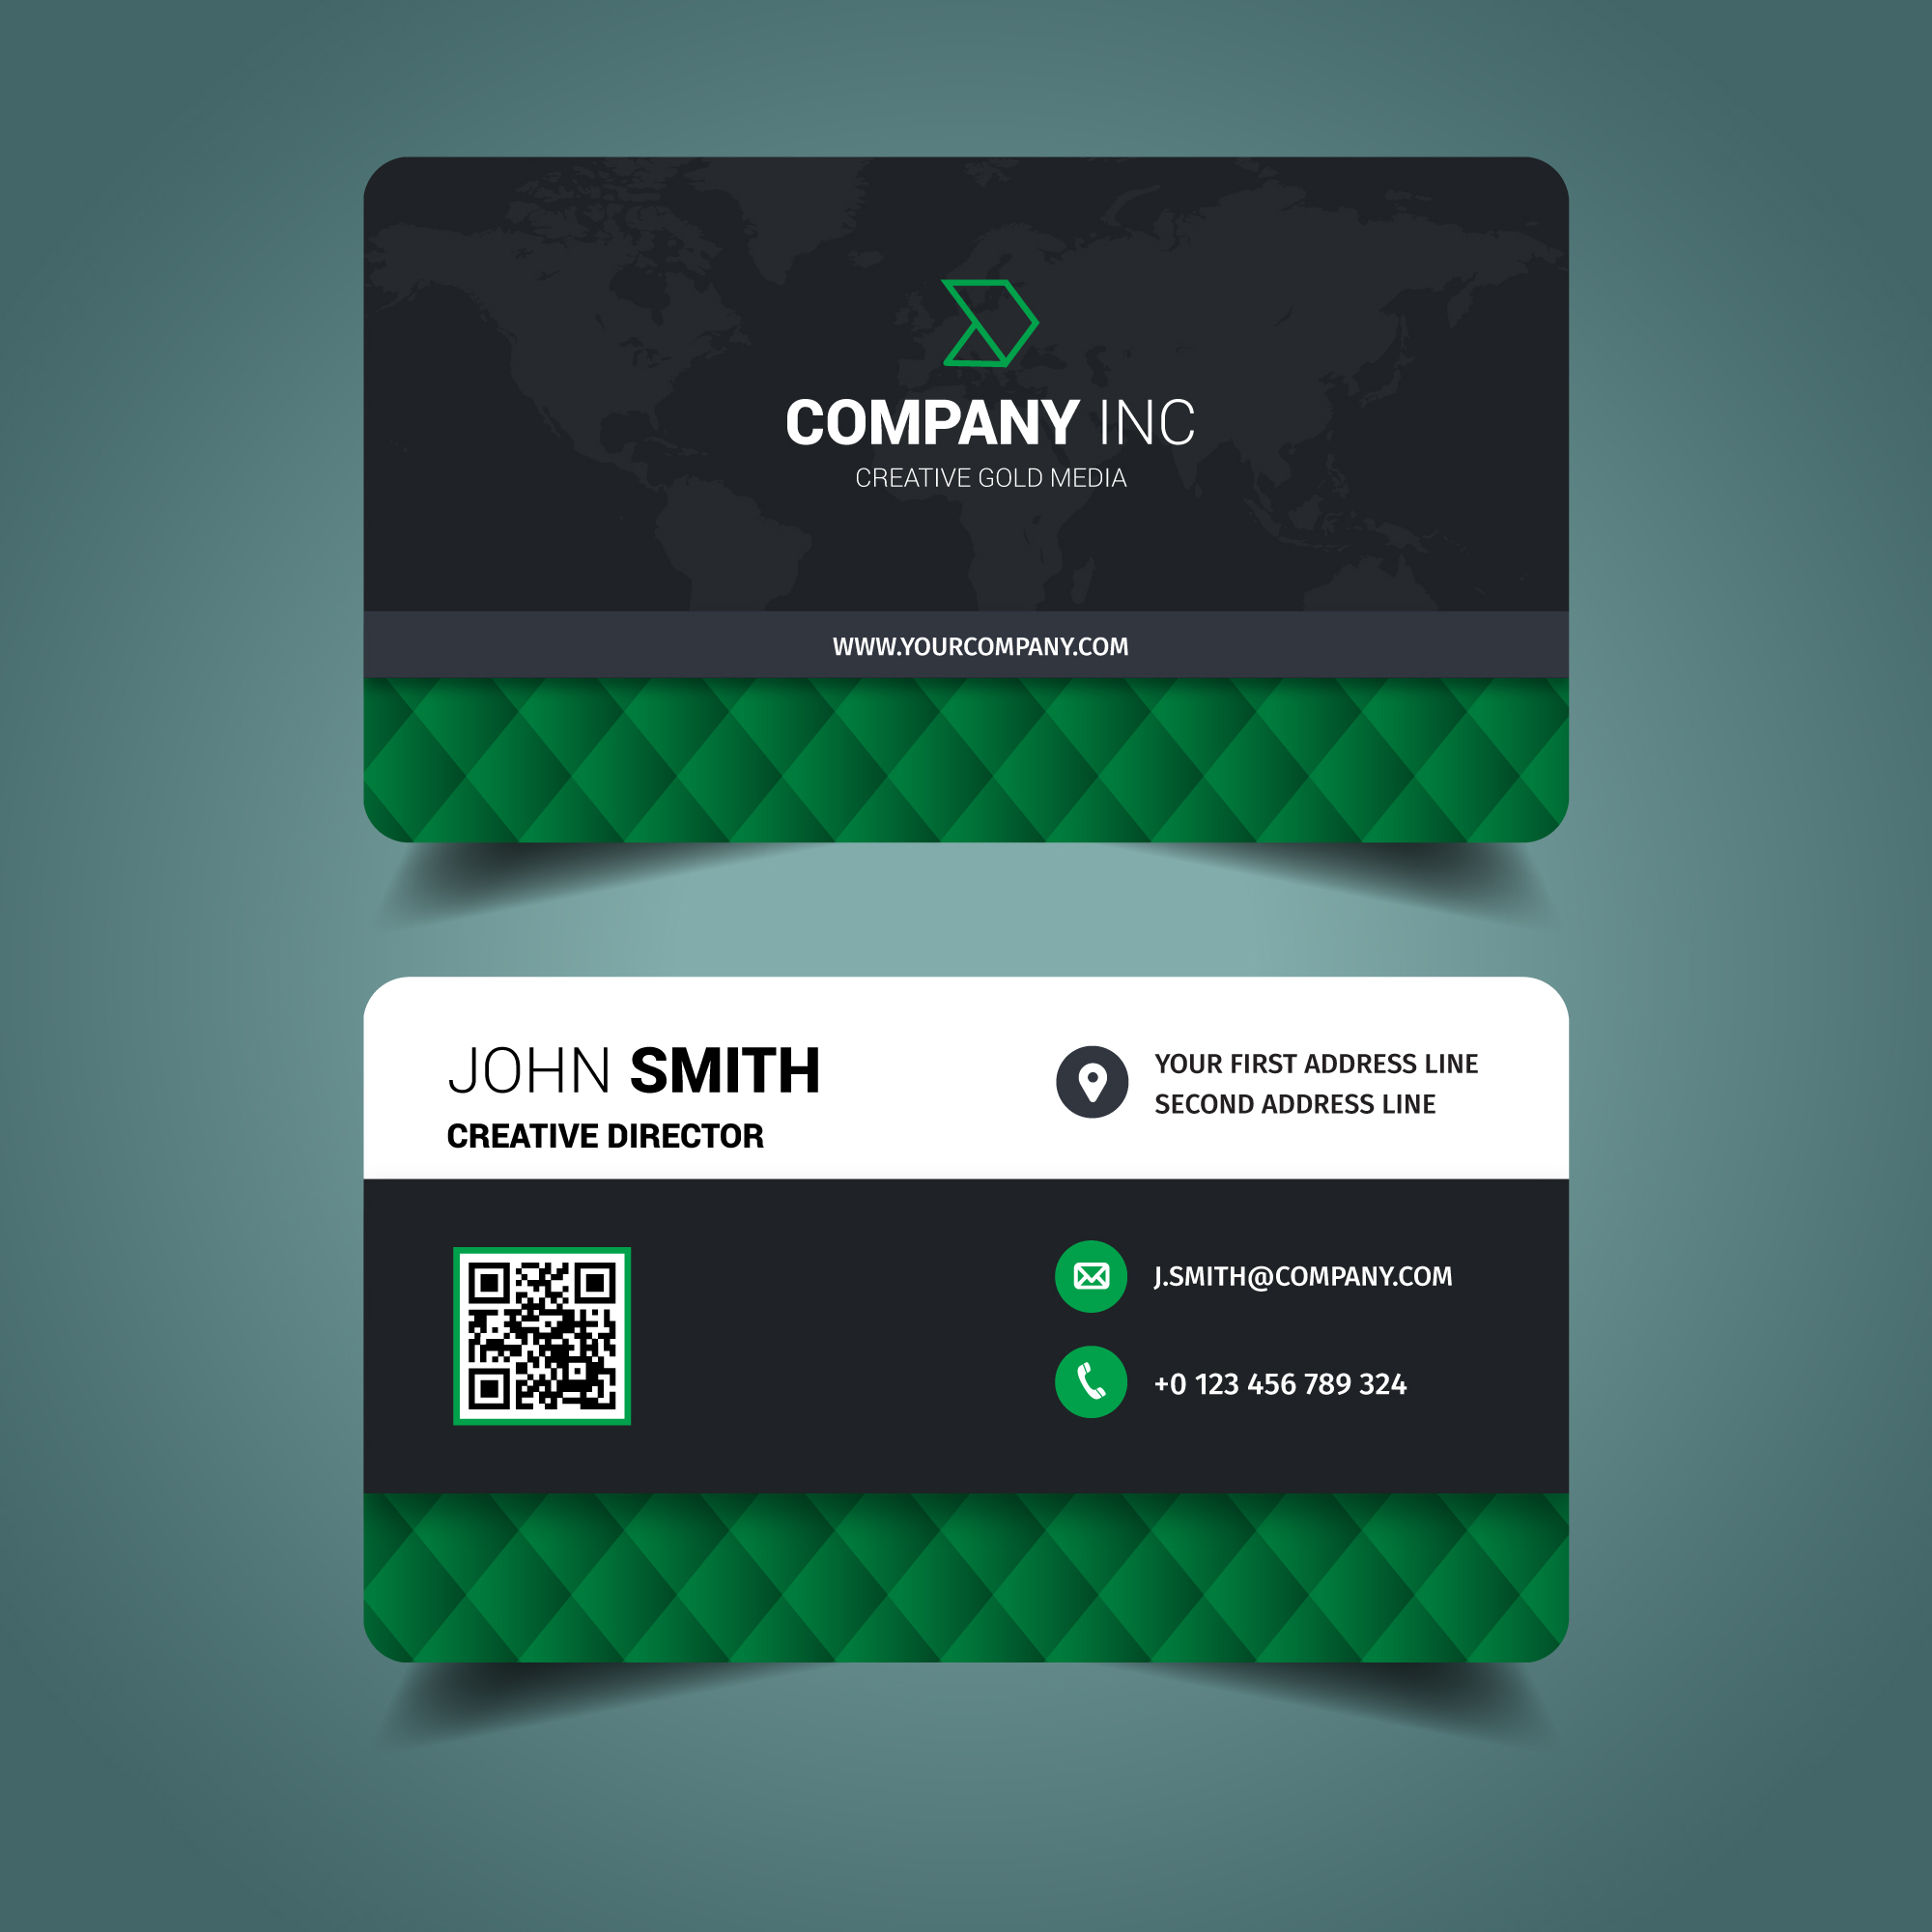 Green Elegant Business Card - Download Free Vector Art, Stock ...